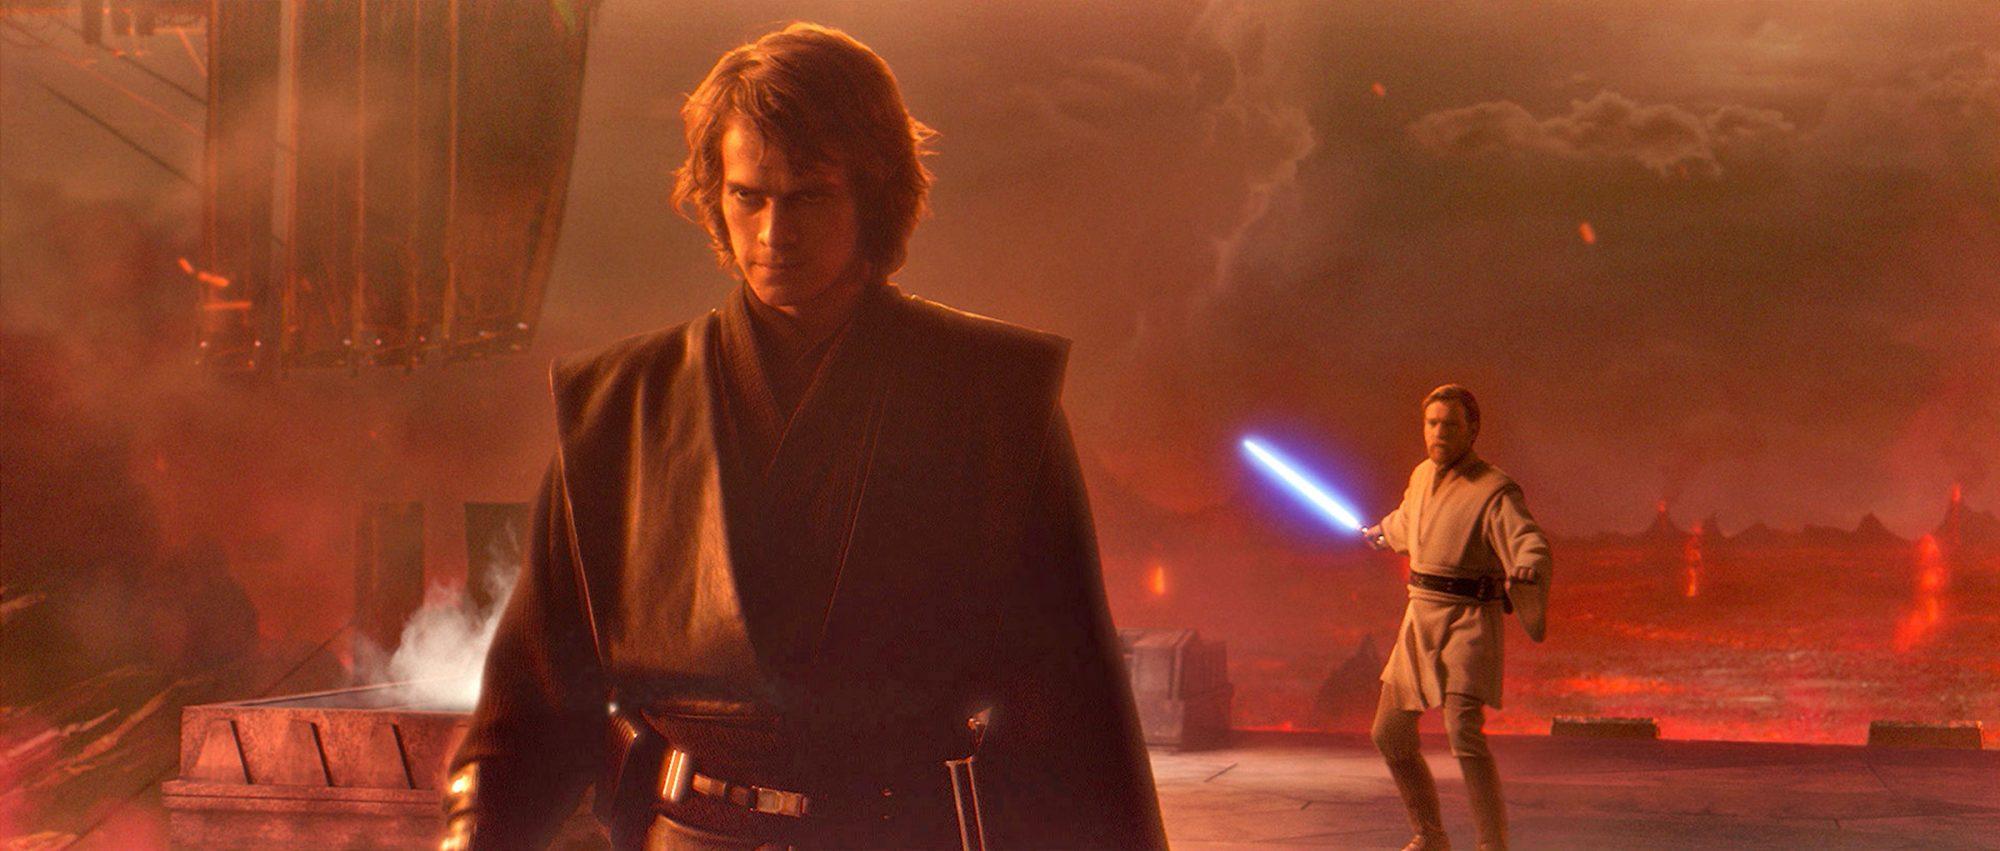 Inside The Star Wars Prequels 3 Best Lightsaber Fights Ew Com